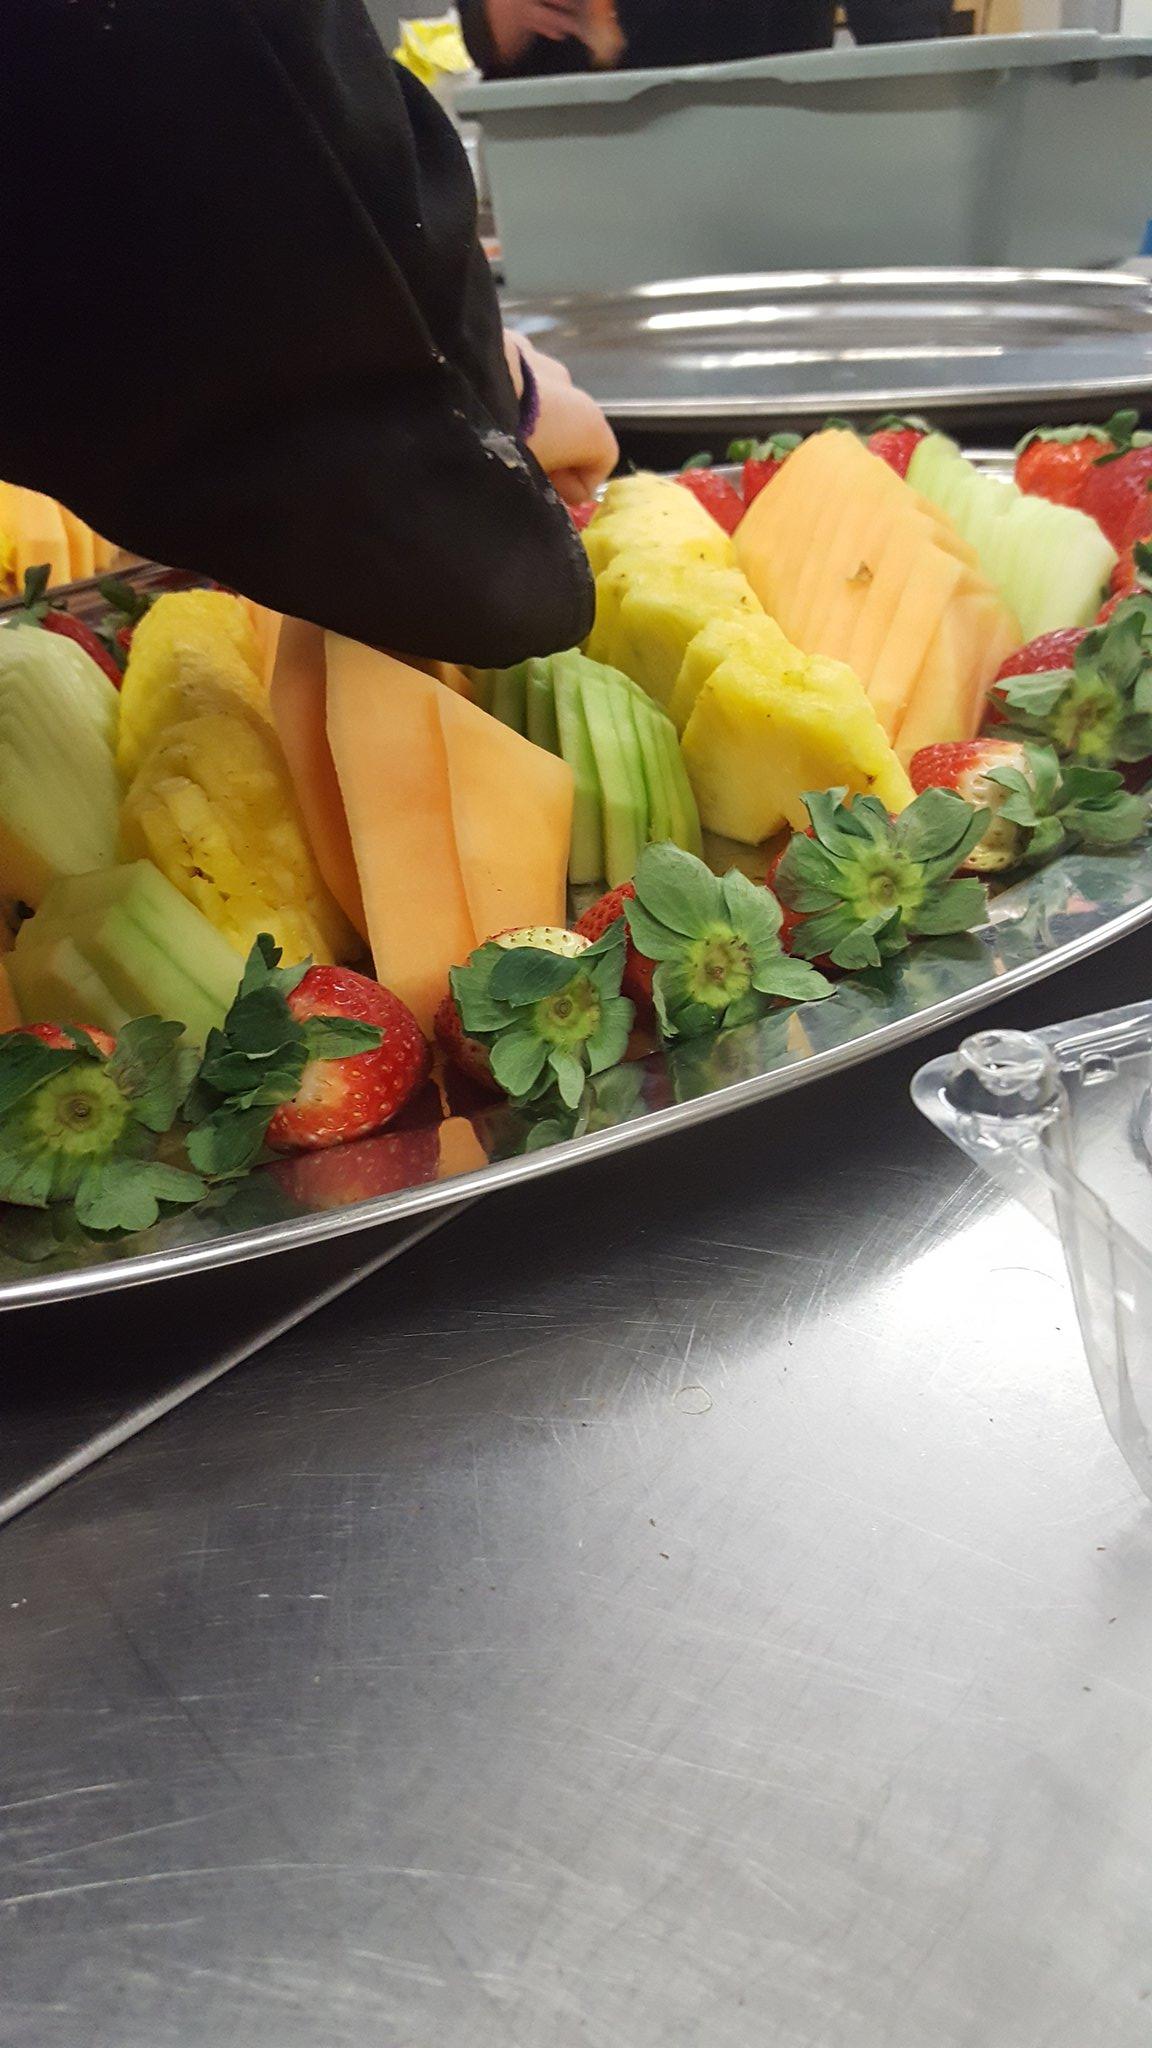 Fruit trays for formal dinner. #tldsblearns #feedallfour @infobml https://t.co/7HMroGz2RX